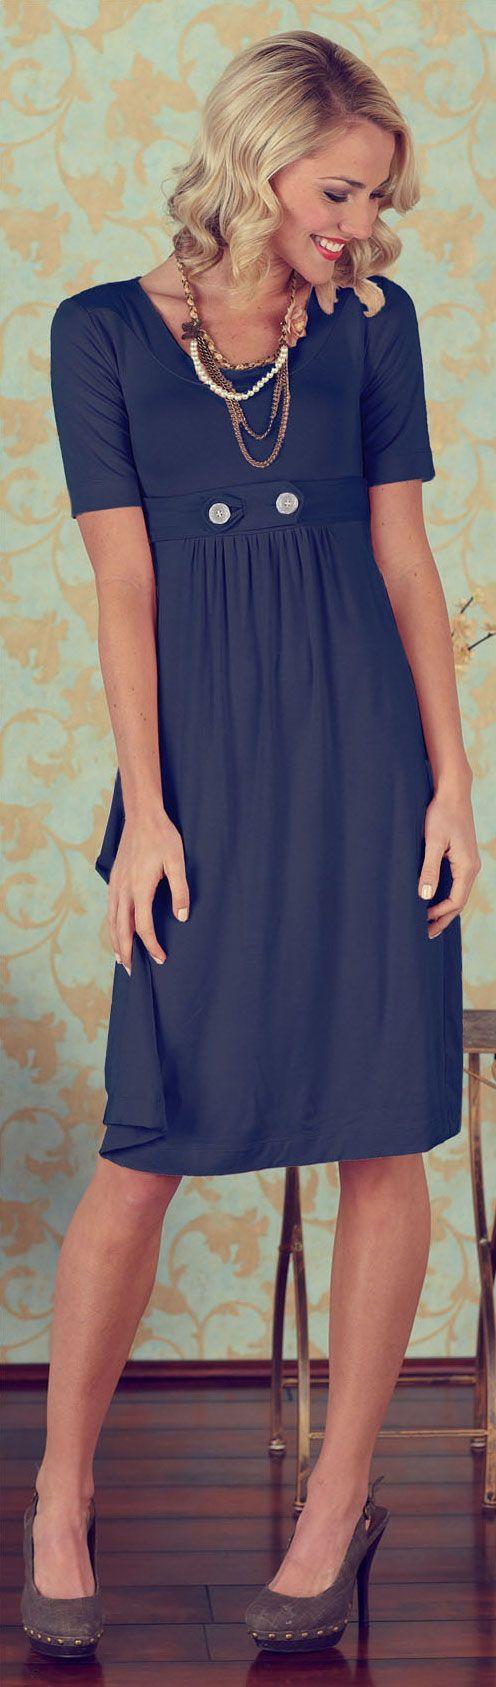 Super cute modest dresses - Jen Clothing